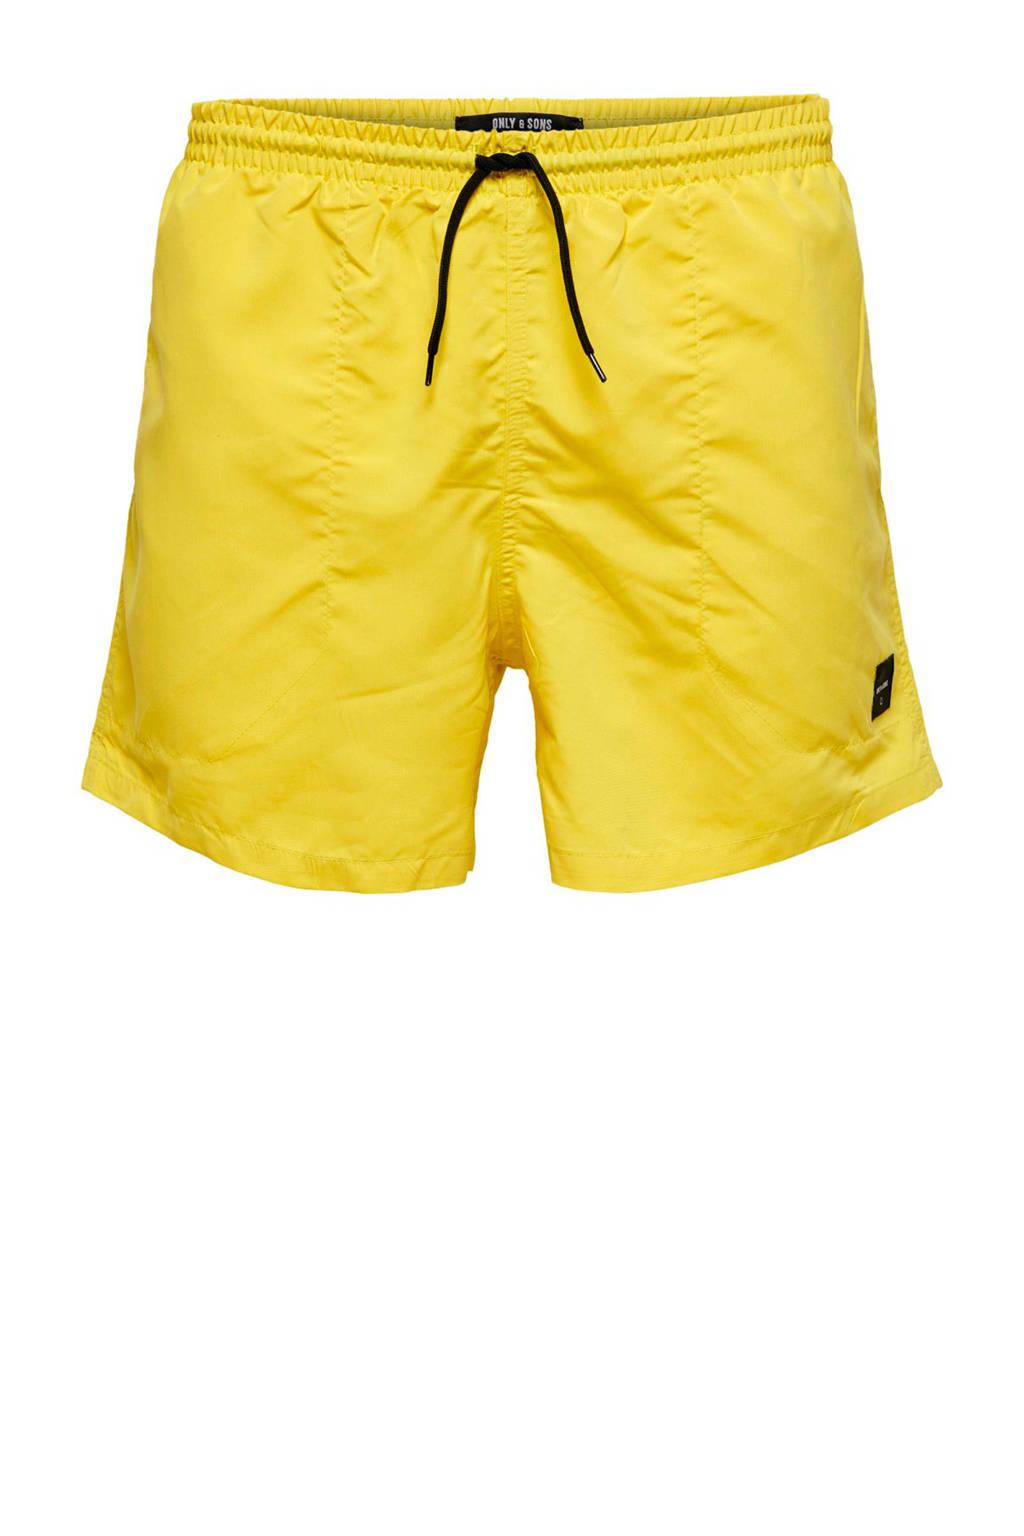 Only & Sons zwemshort geel, Geel